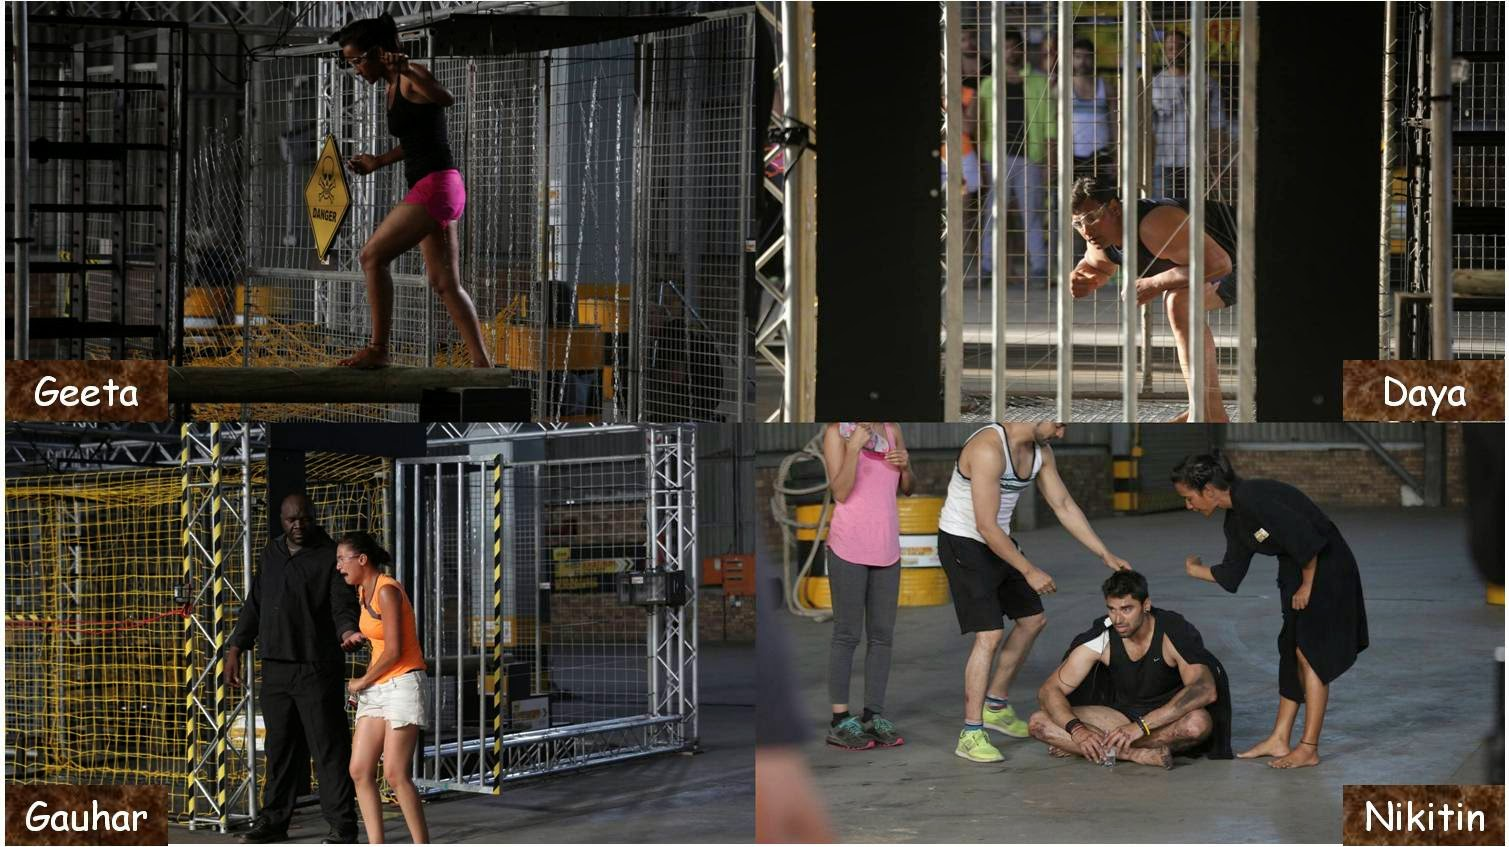 Khatron Ke Khiladi contestants Geeta, Daya, Gauhar and Nikitin during and after electric Shock Therapy stunt